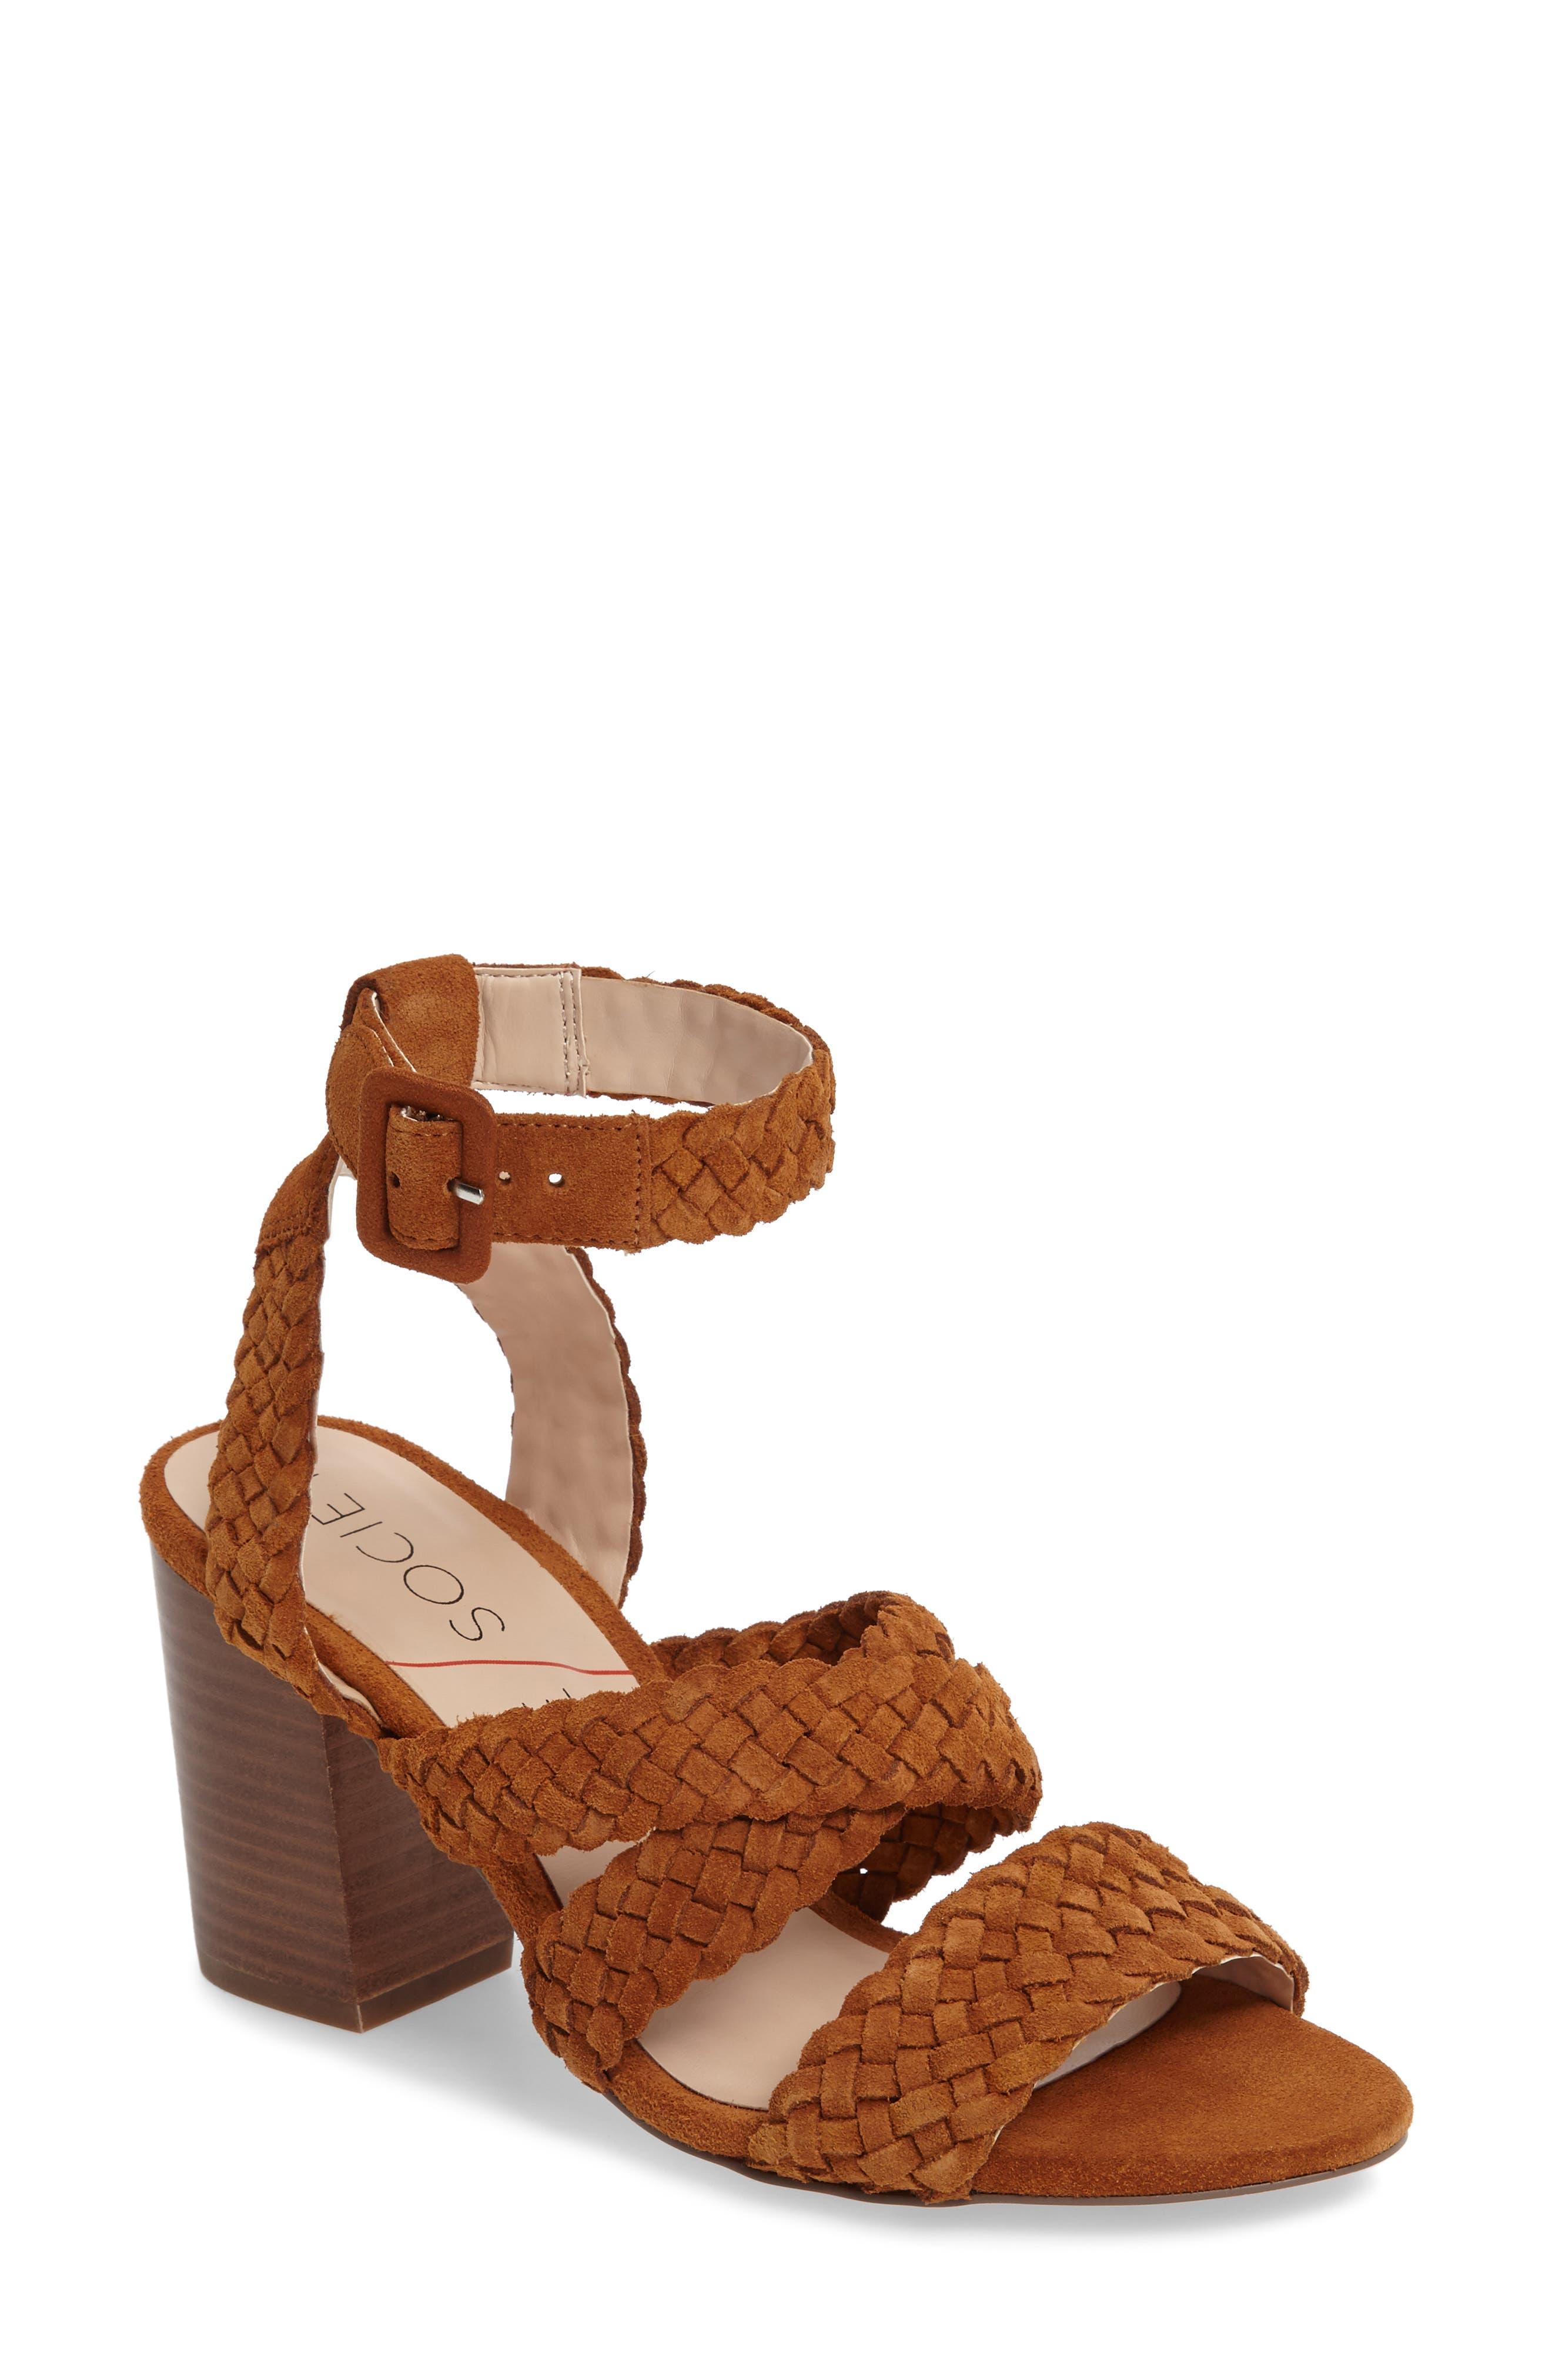 SOLE SOCIETY,                             Evelina Block Heel Sandal,                             Main thumbnail 1, color,                             240